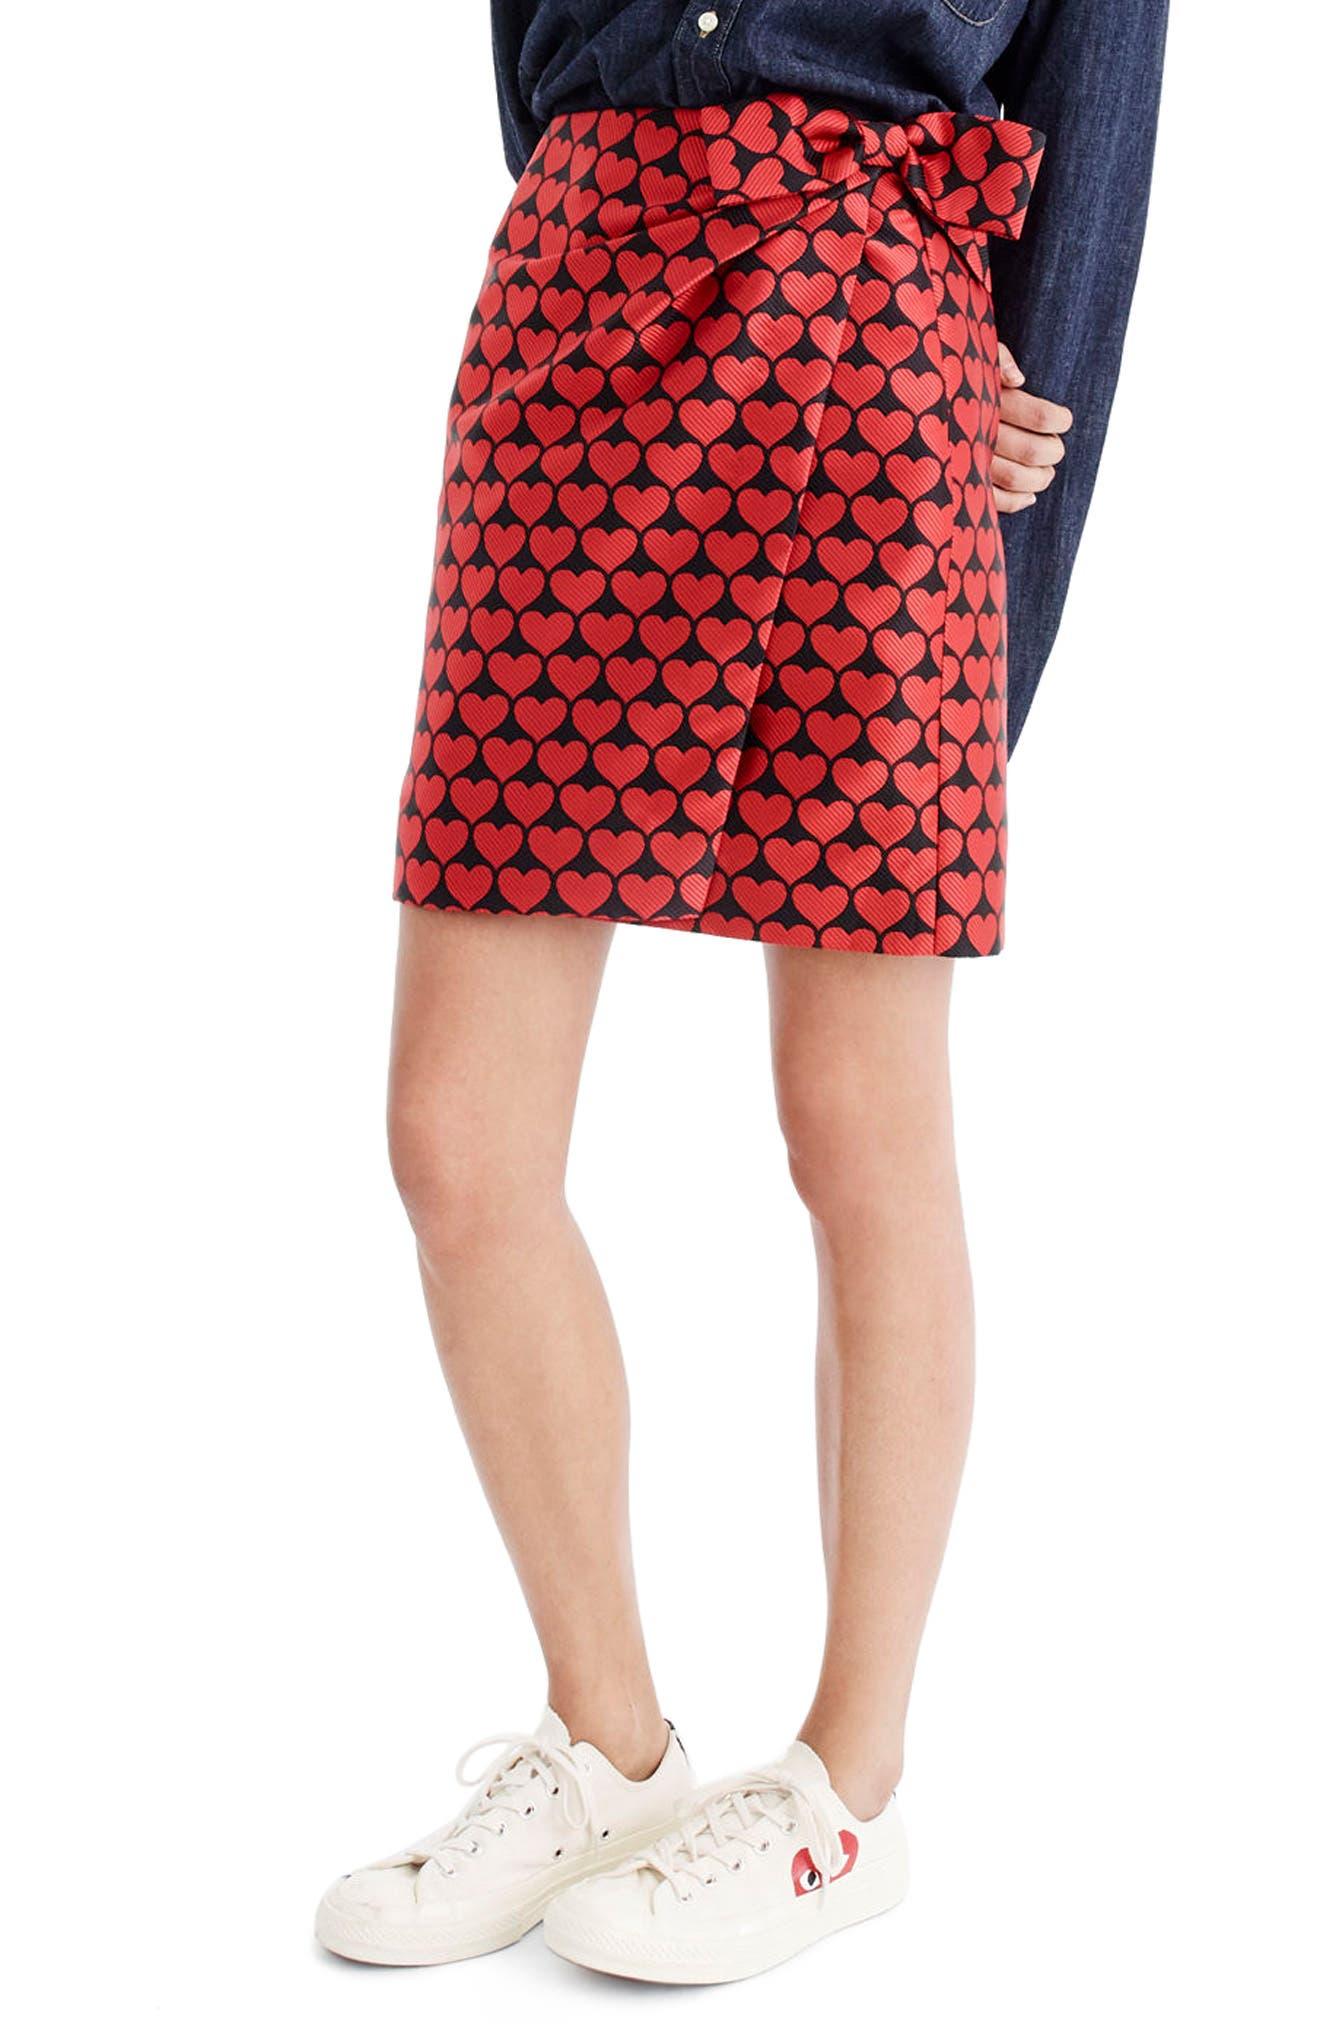 J.Crew Castlebar Snuggle Heart Skirt (Regular & Petite)